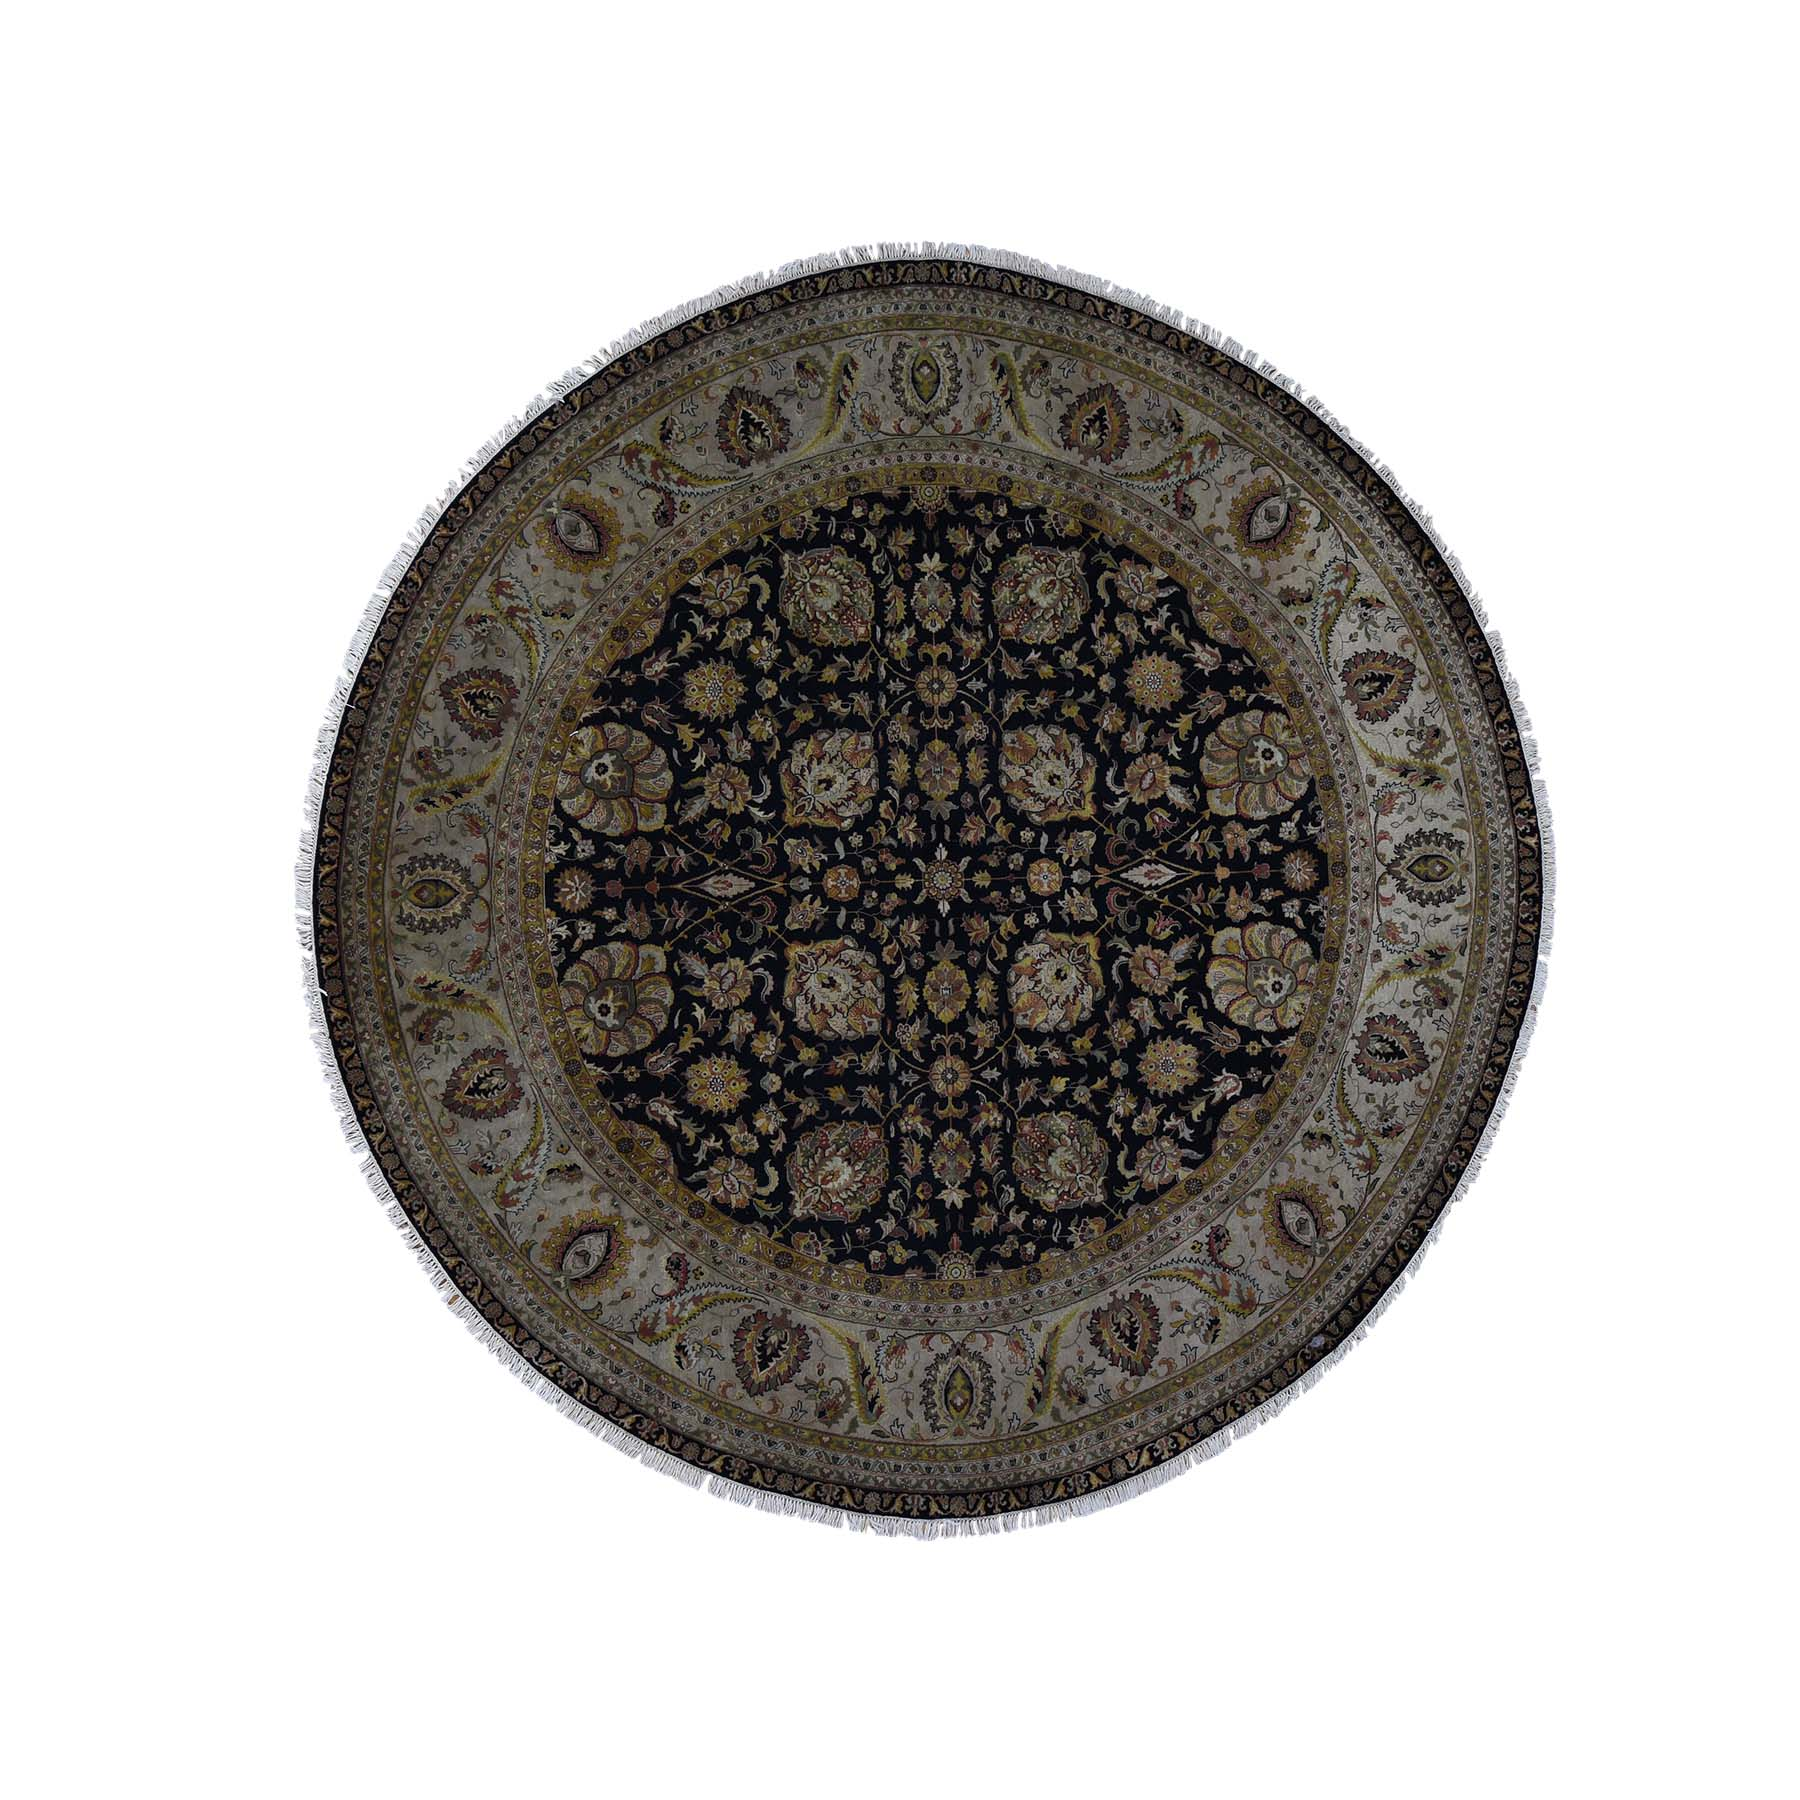 10'X10' New Zealand Wool Tabriz 300 Kpsi Hand Spun Round Hand-Knotted Oriental Rug moadbb7a